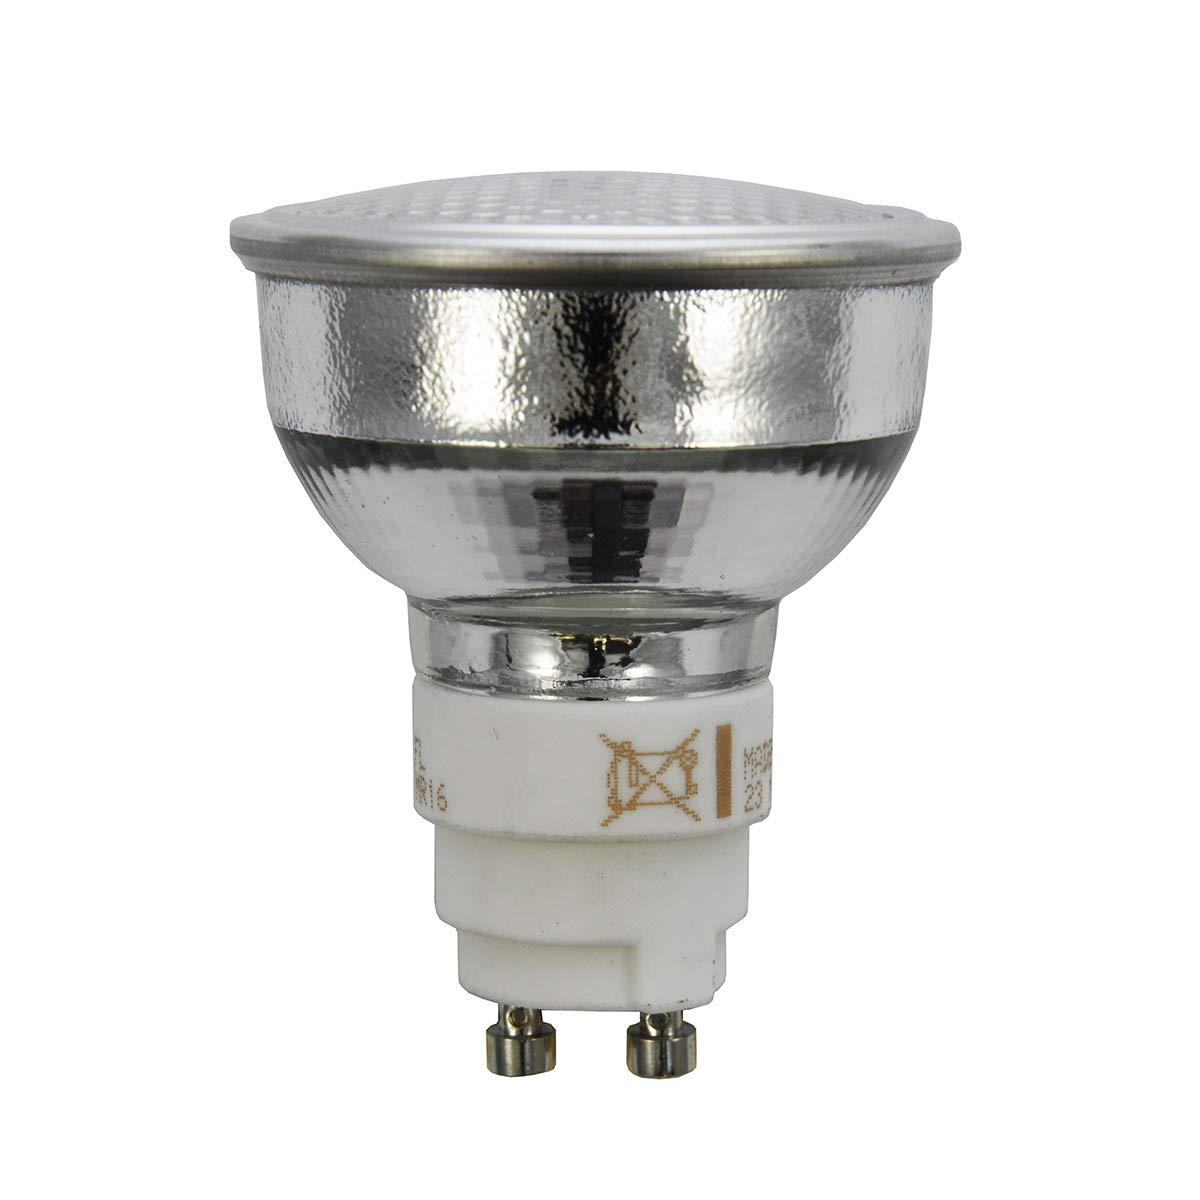 GE Lighting 85110 MR16 Ceramic Metal Halide Lamp 20 Watt GX10 Turn and Lock Base 1000 Lumens 80 CRI 3000K ConstantColor CMH